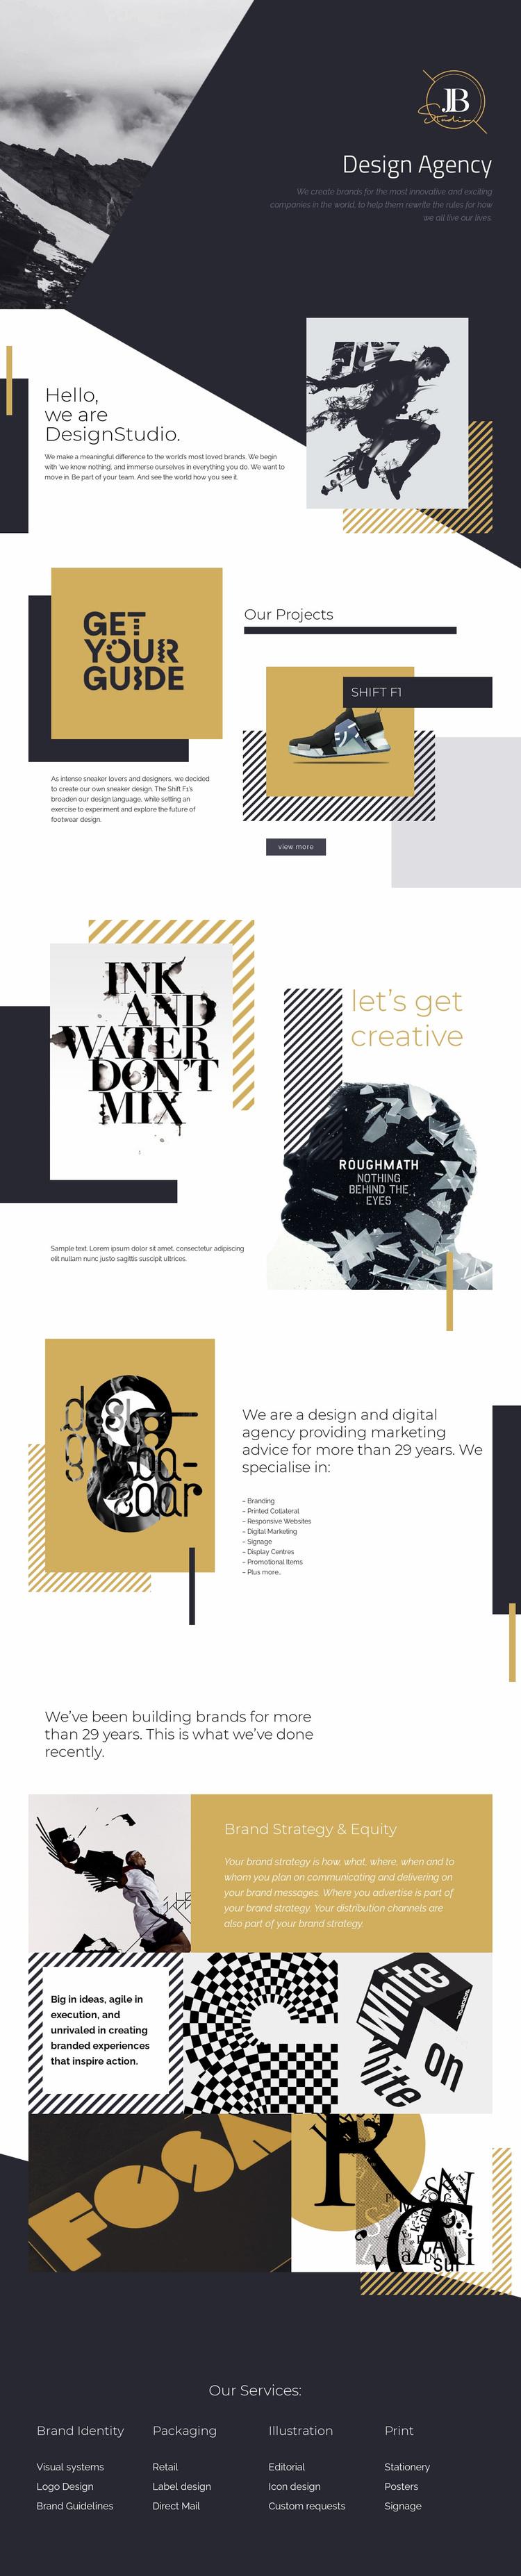 We create amazing websites Web Page Designer